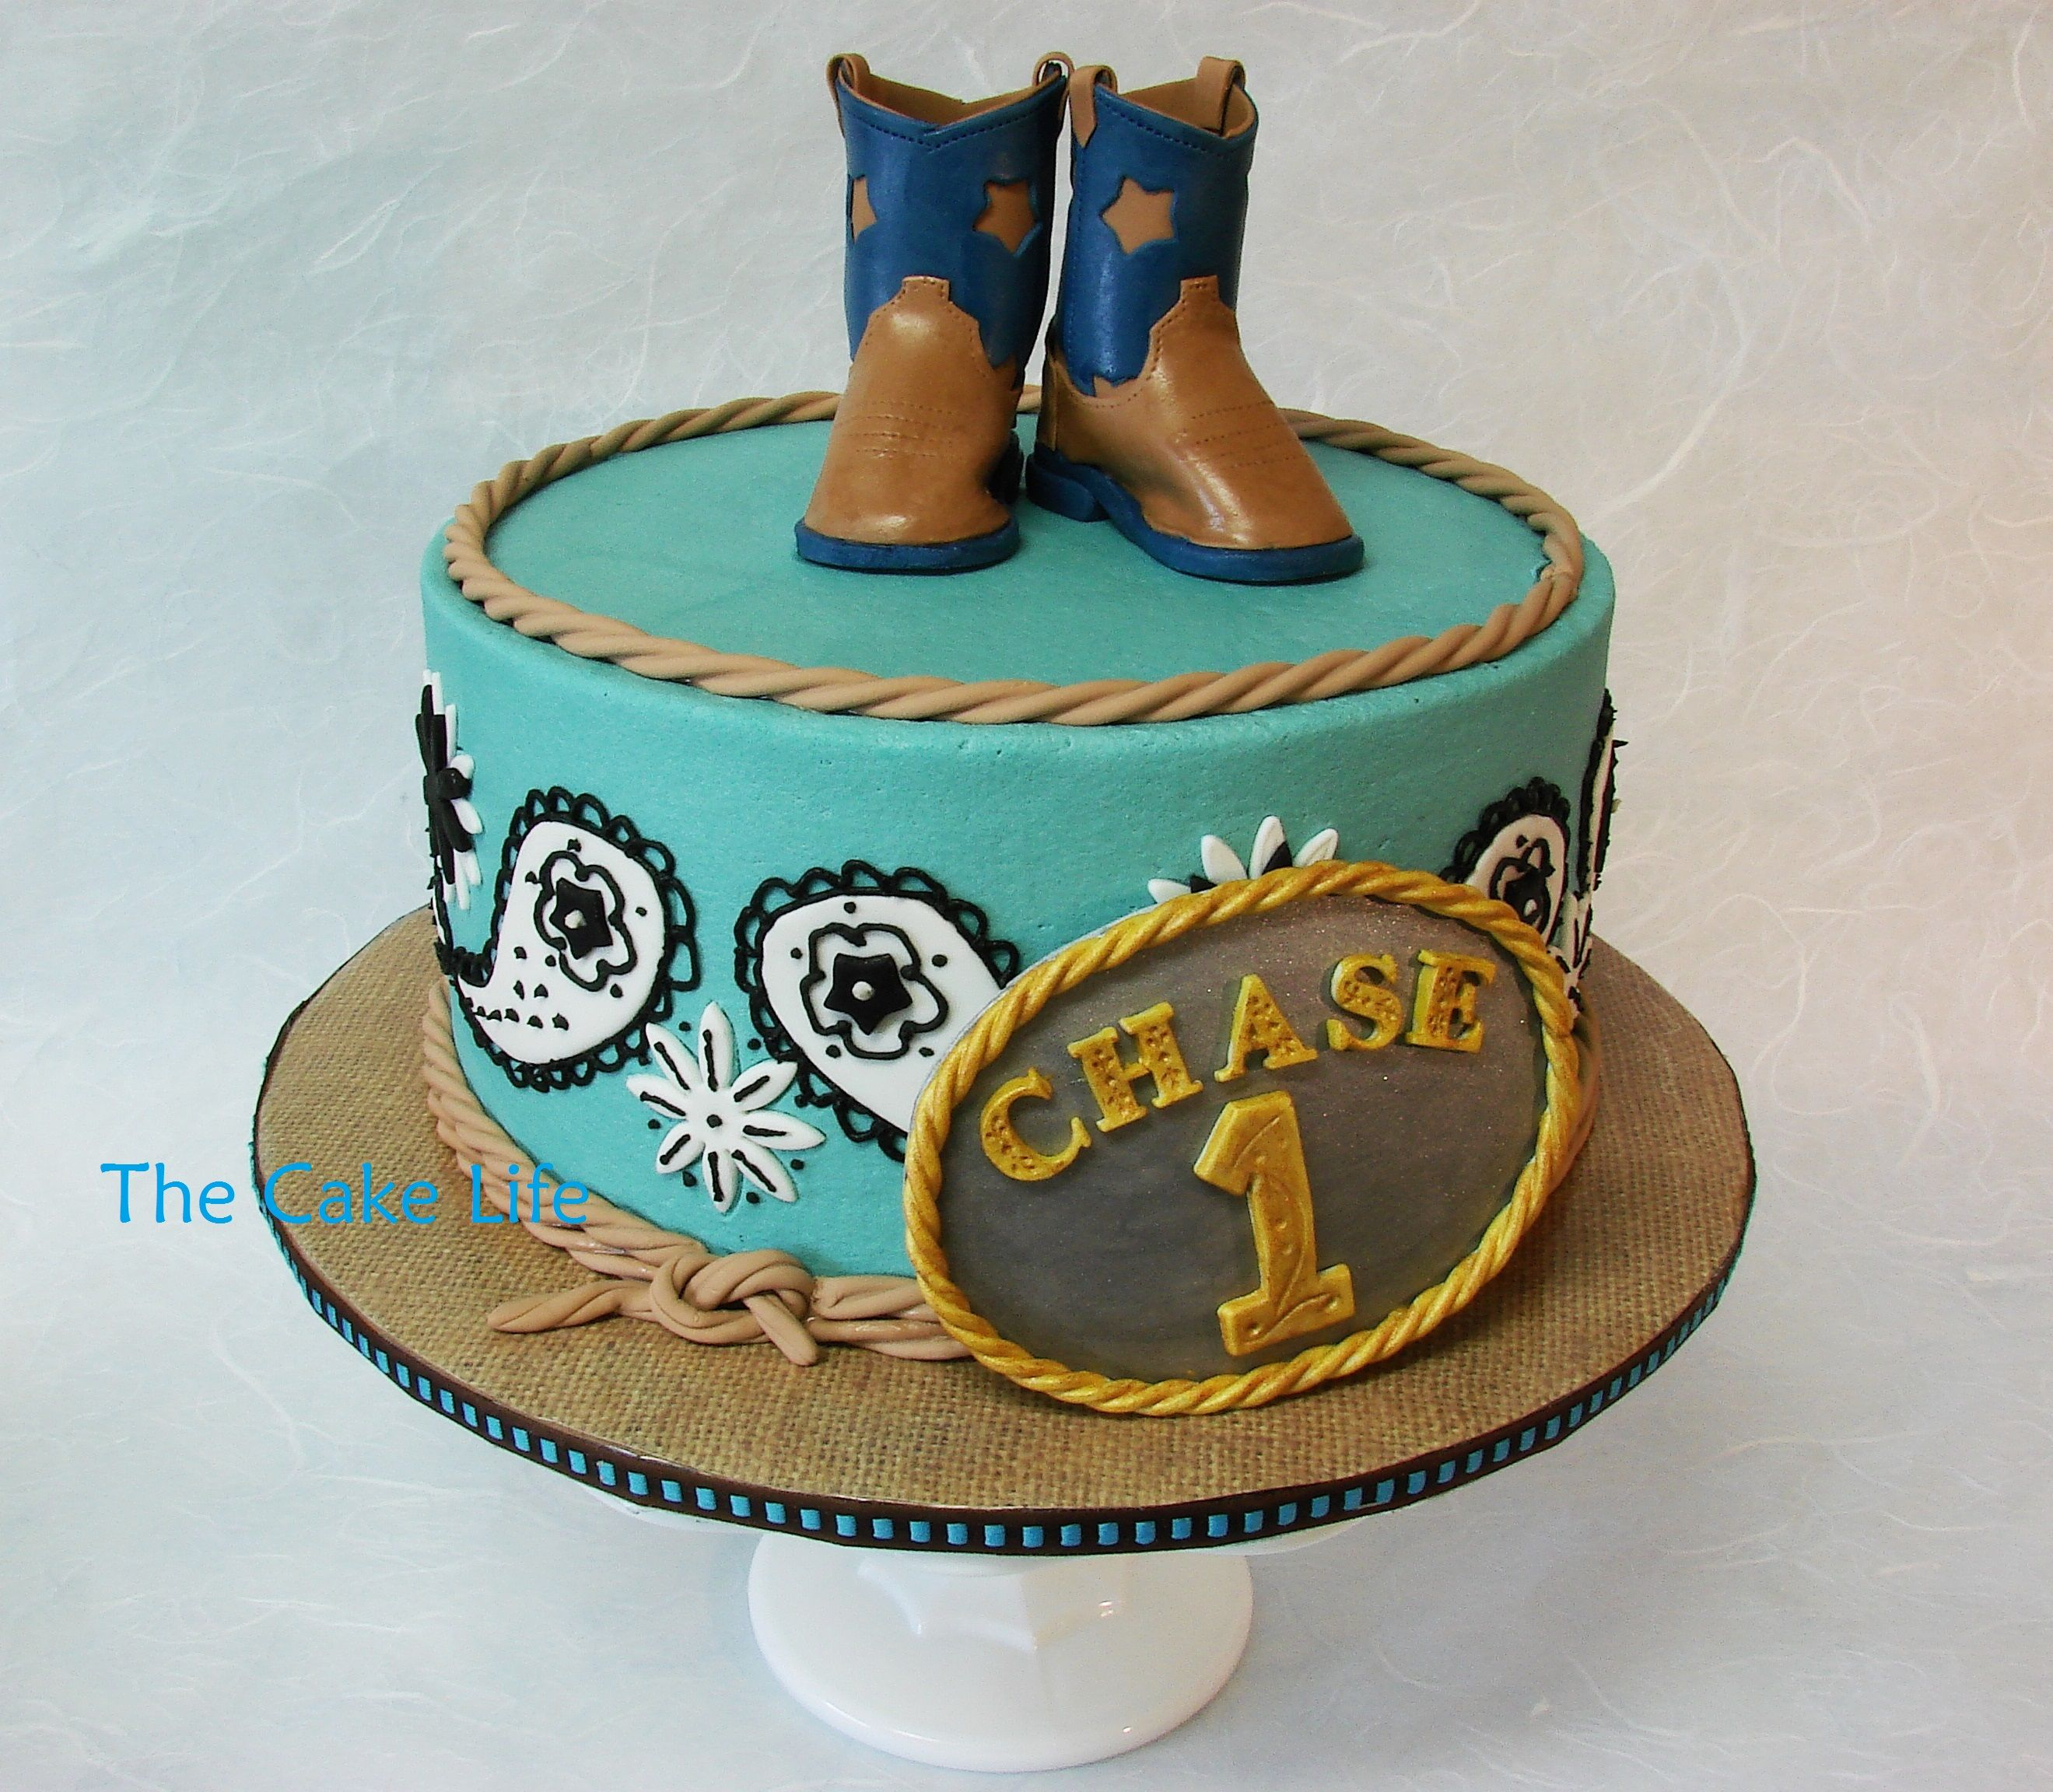 Pleasing Cowboy Themed 1St Birthday Cake With Fondant Belt Buckle And Funny Birthday Cards Online Alyptdamsfinfo